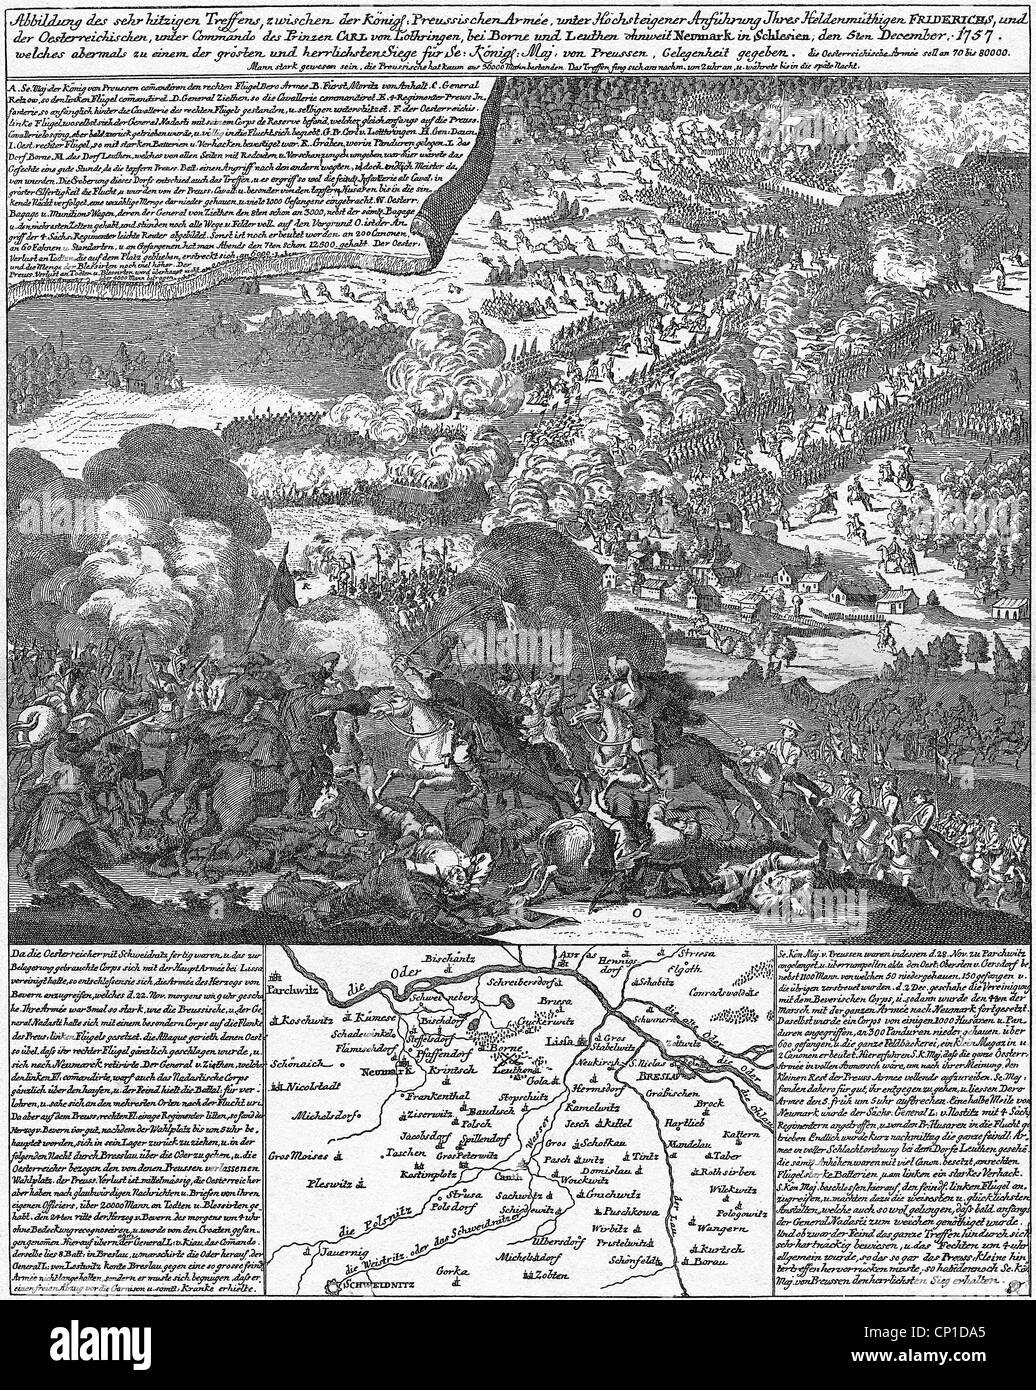 battle of leuthen